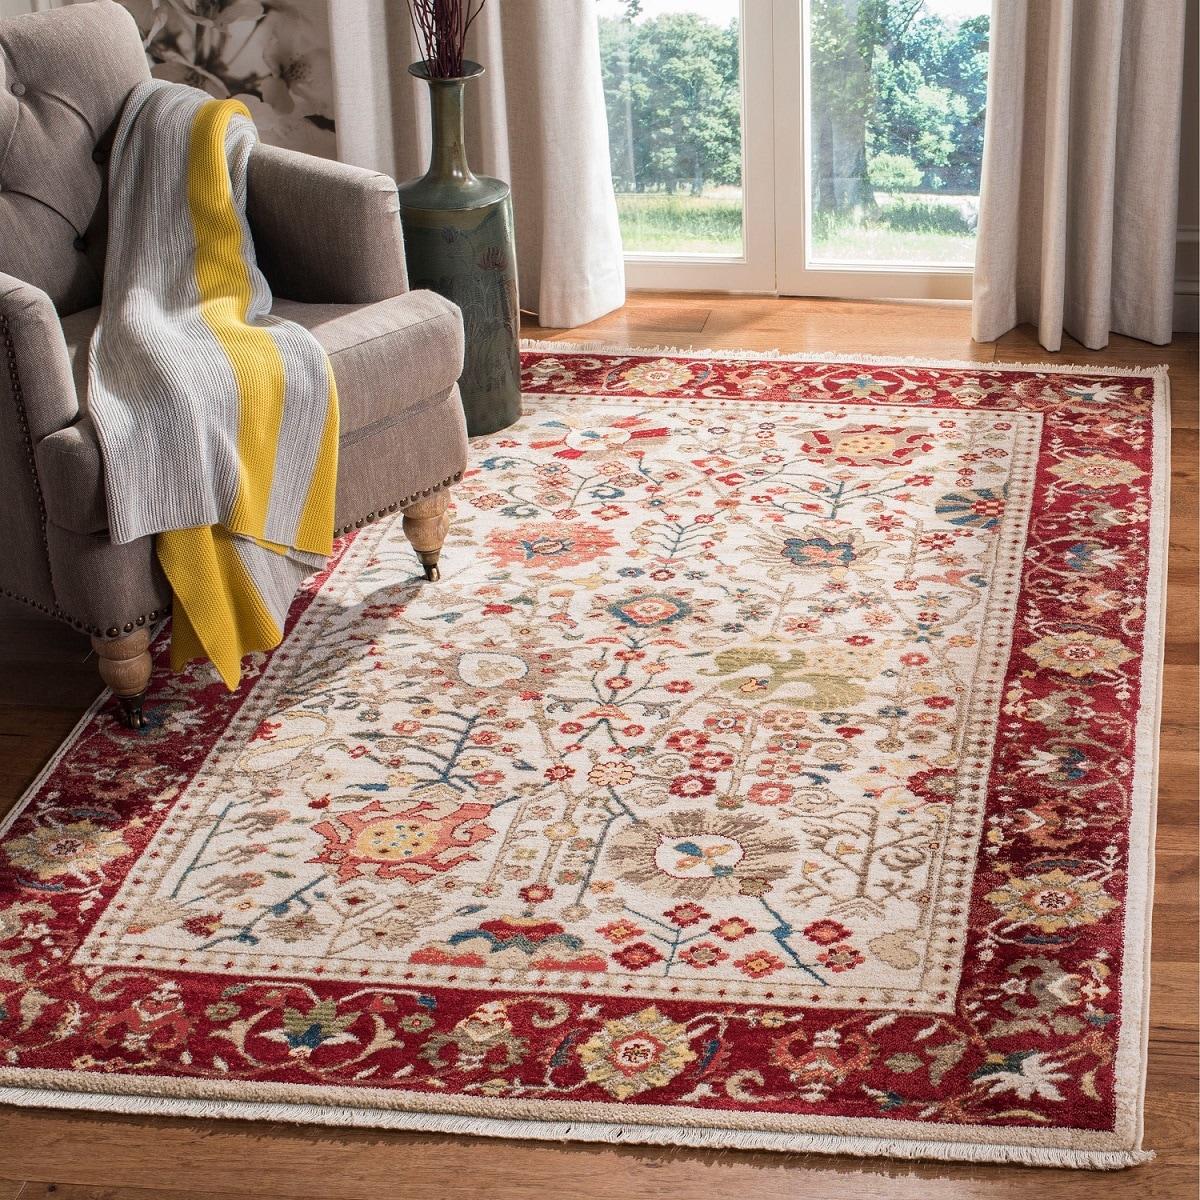 Oriental rug for living room | Source: overstock.com